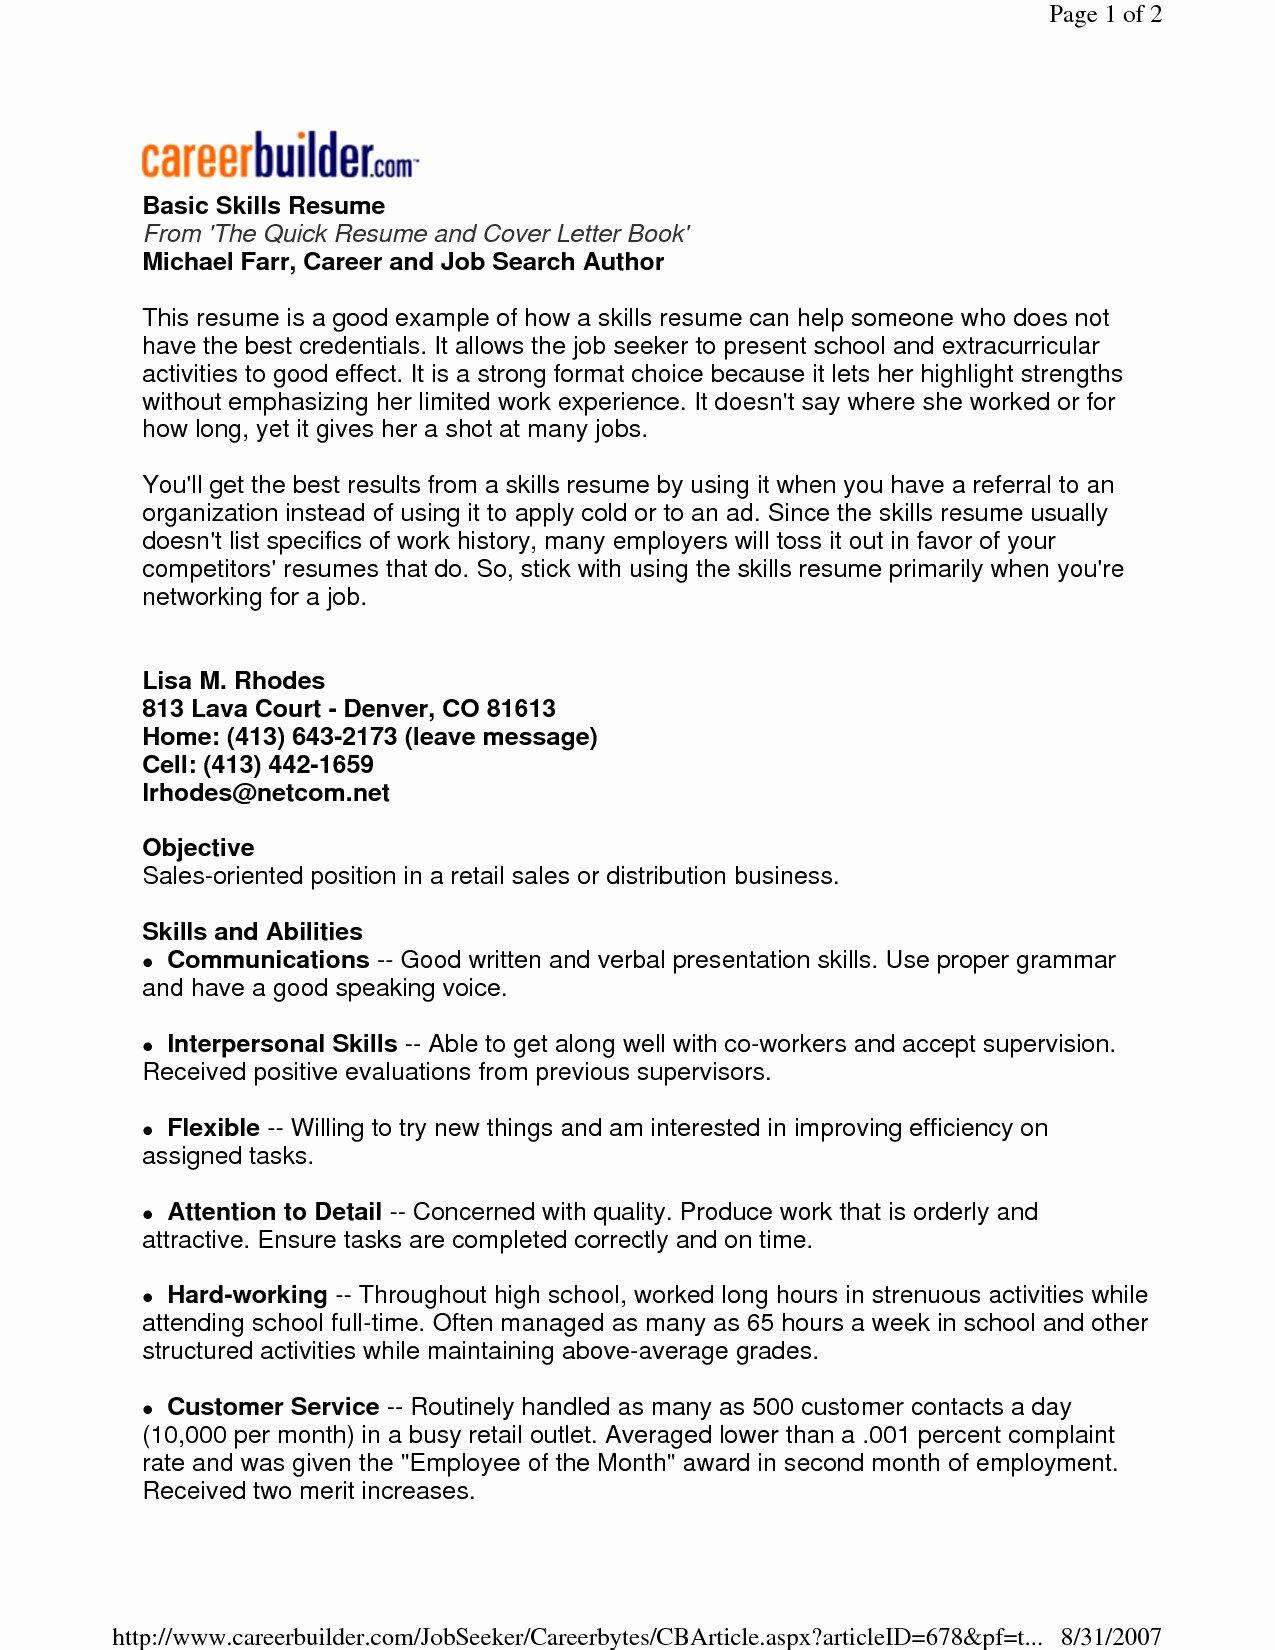 21 Fresh areas Expertise Resume